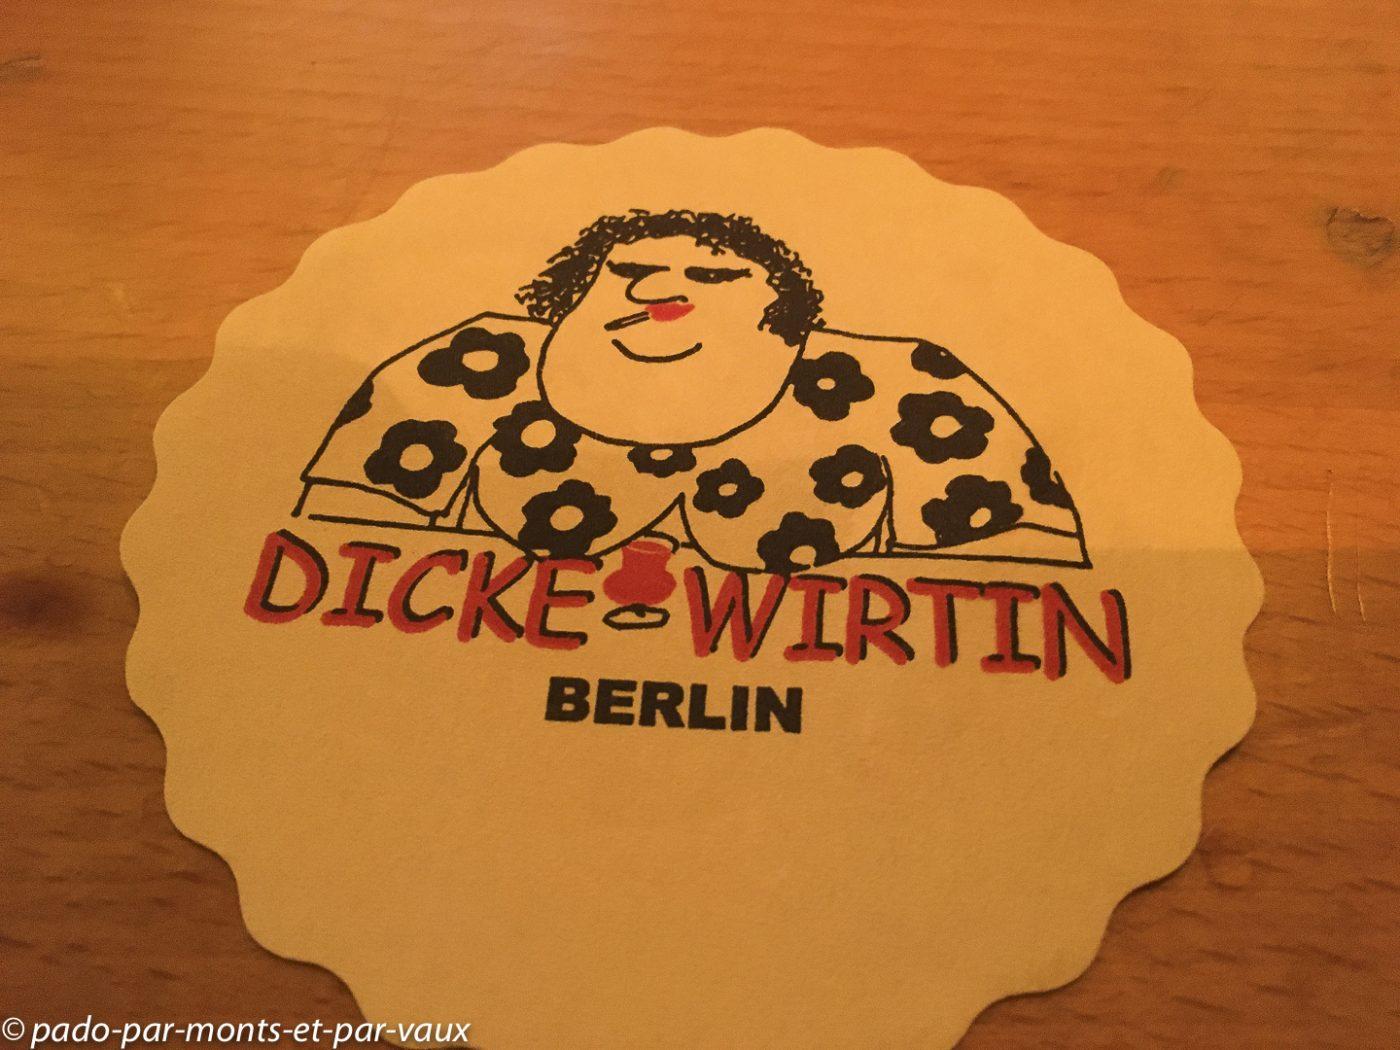 Berlin - Charlottenburg - Dicke Wirtin